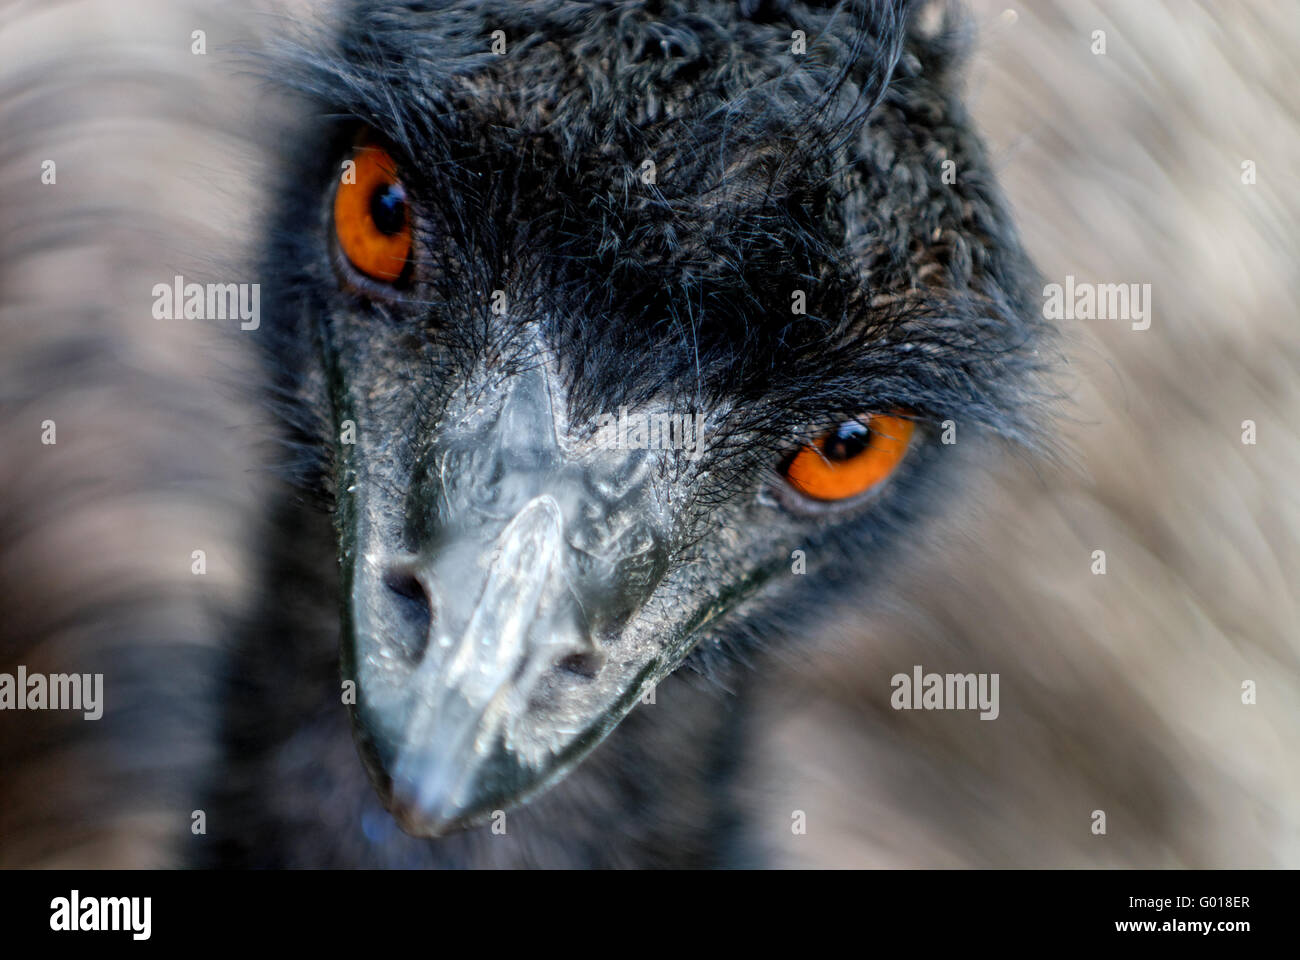 Head of moving Australian Emu (Dromaius novaehollandiae) looking with orange eyes - Stock Image